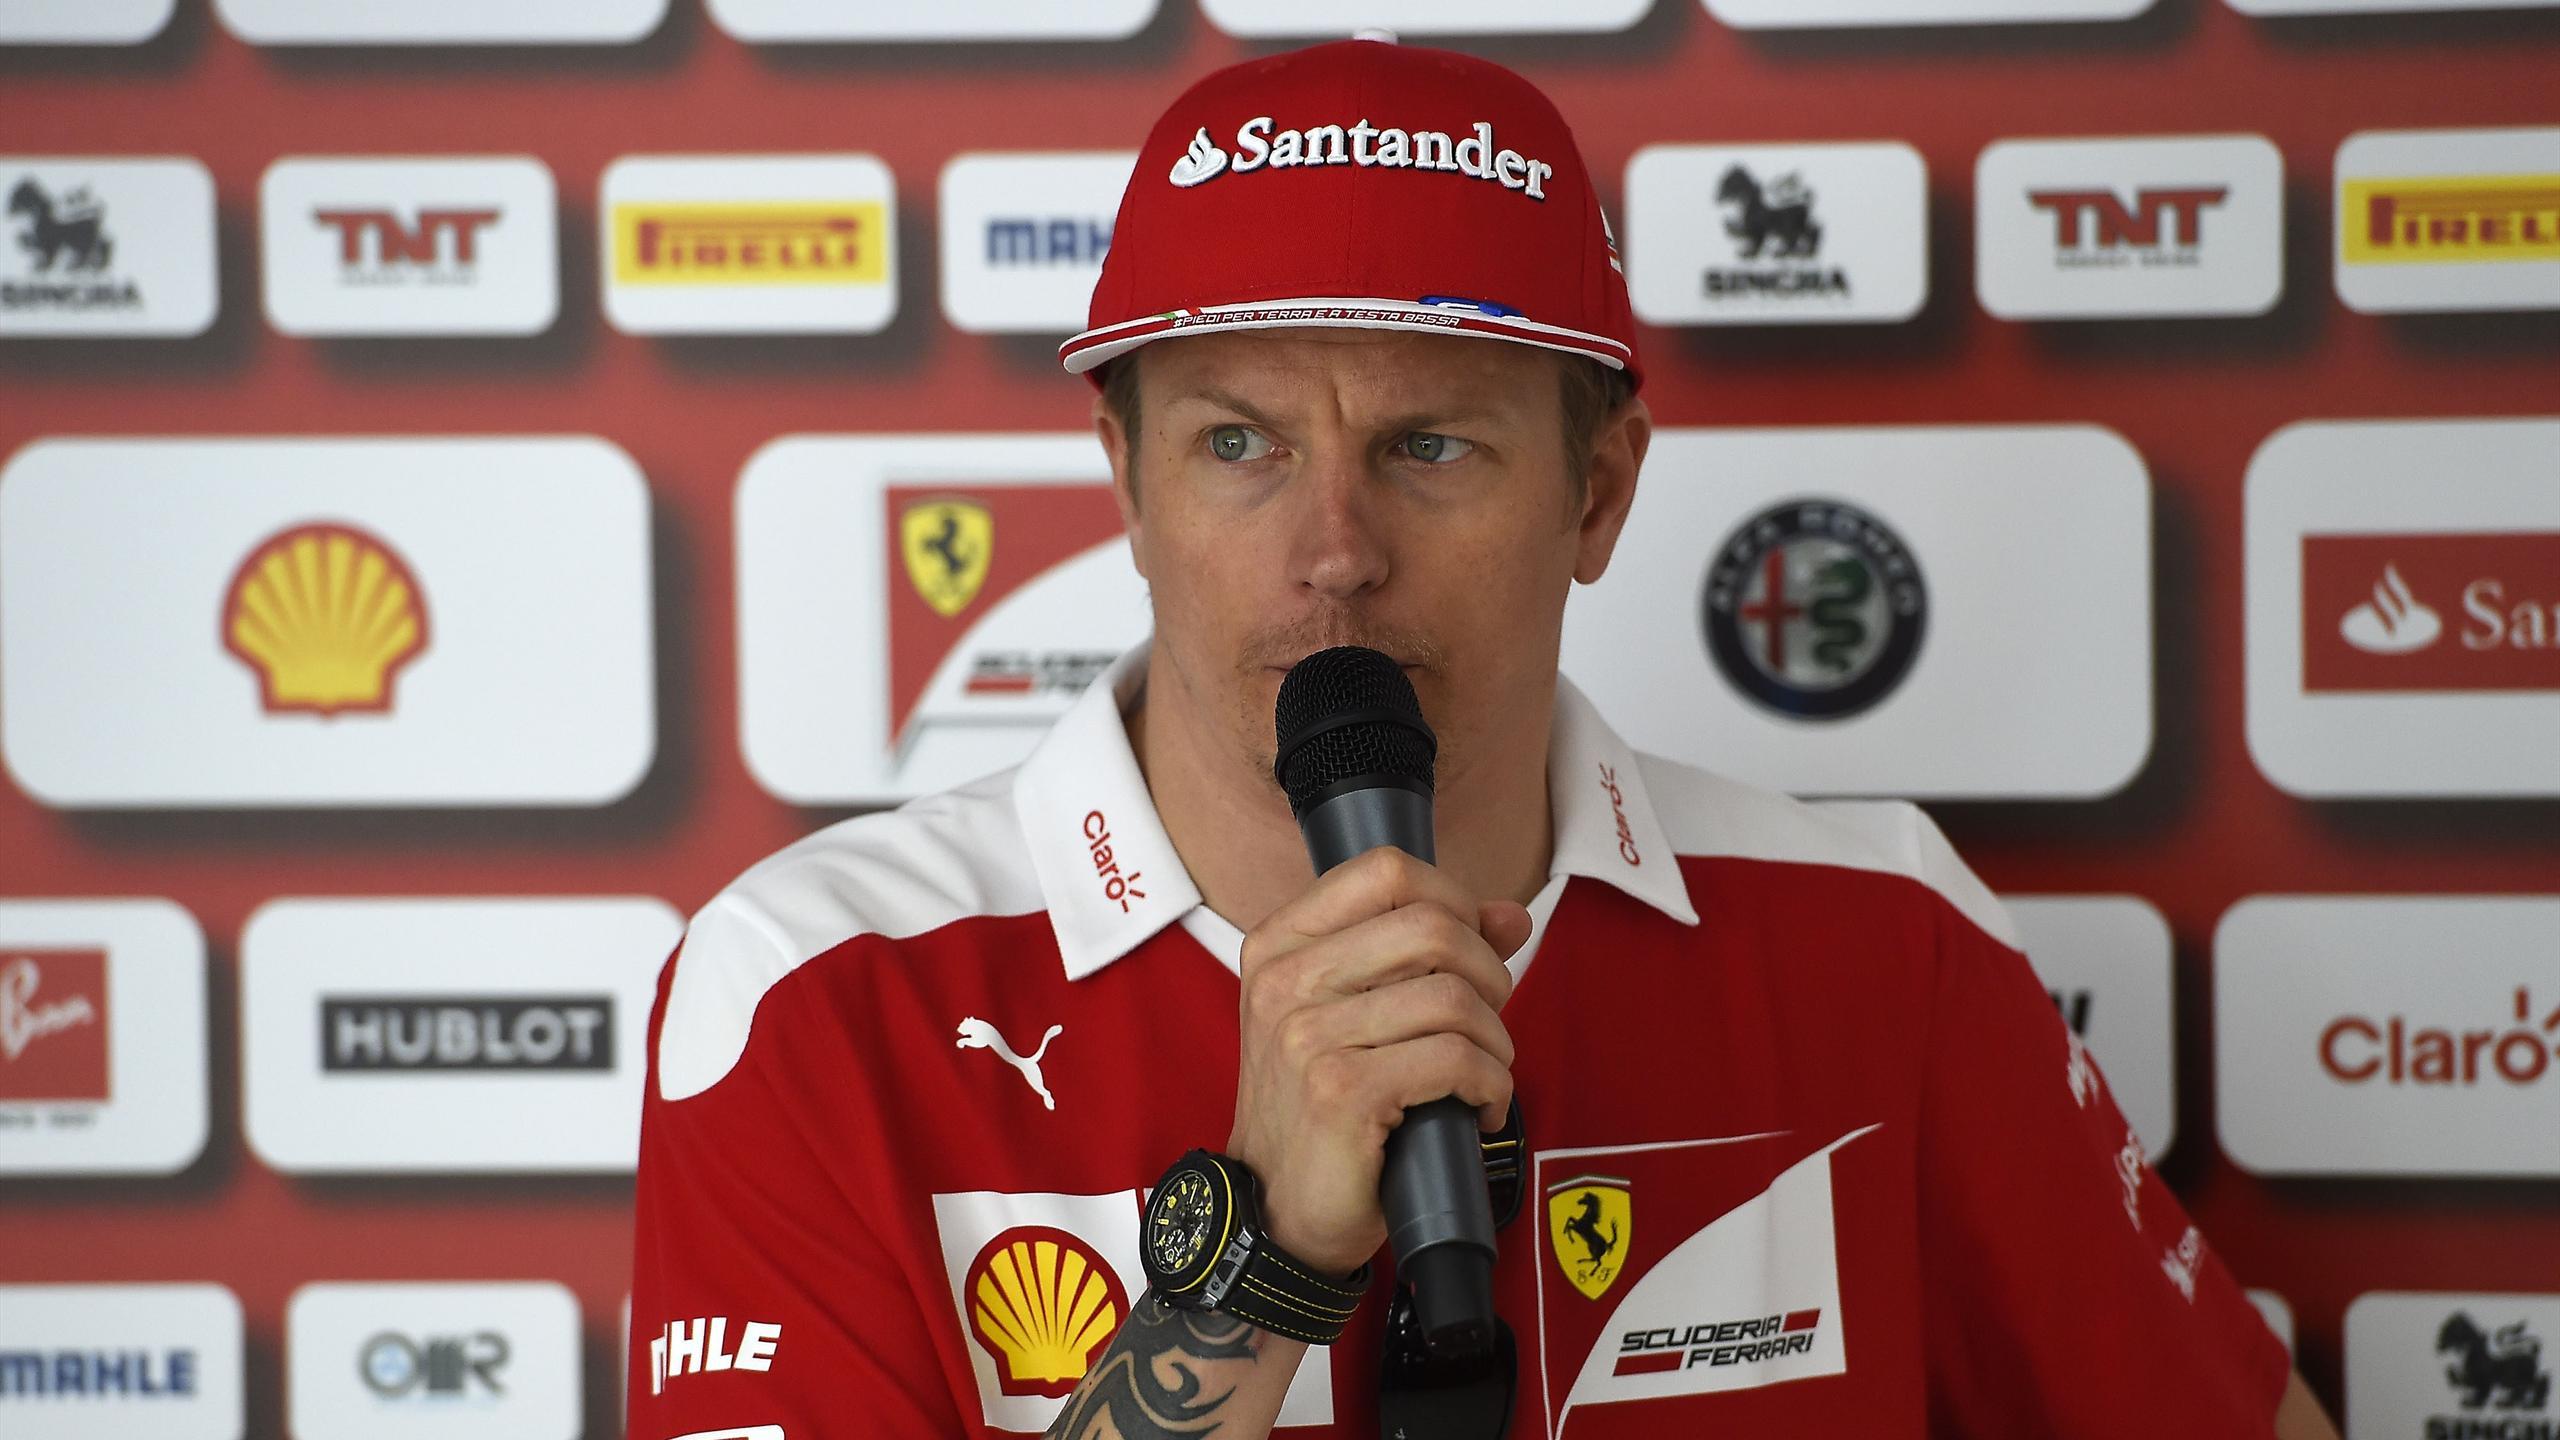 Kimi Räikkönen (Ferrari) au Grand Prix de Hongrie 2016